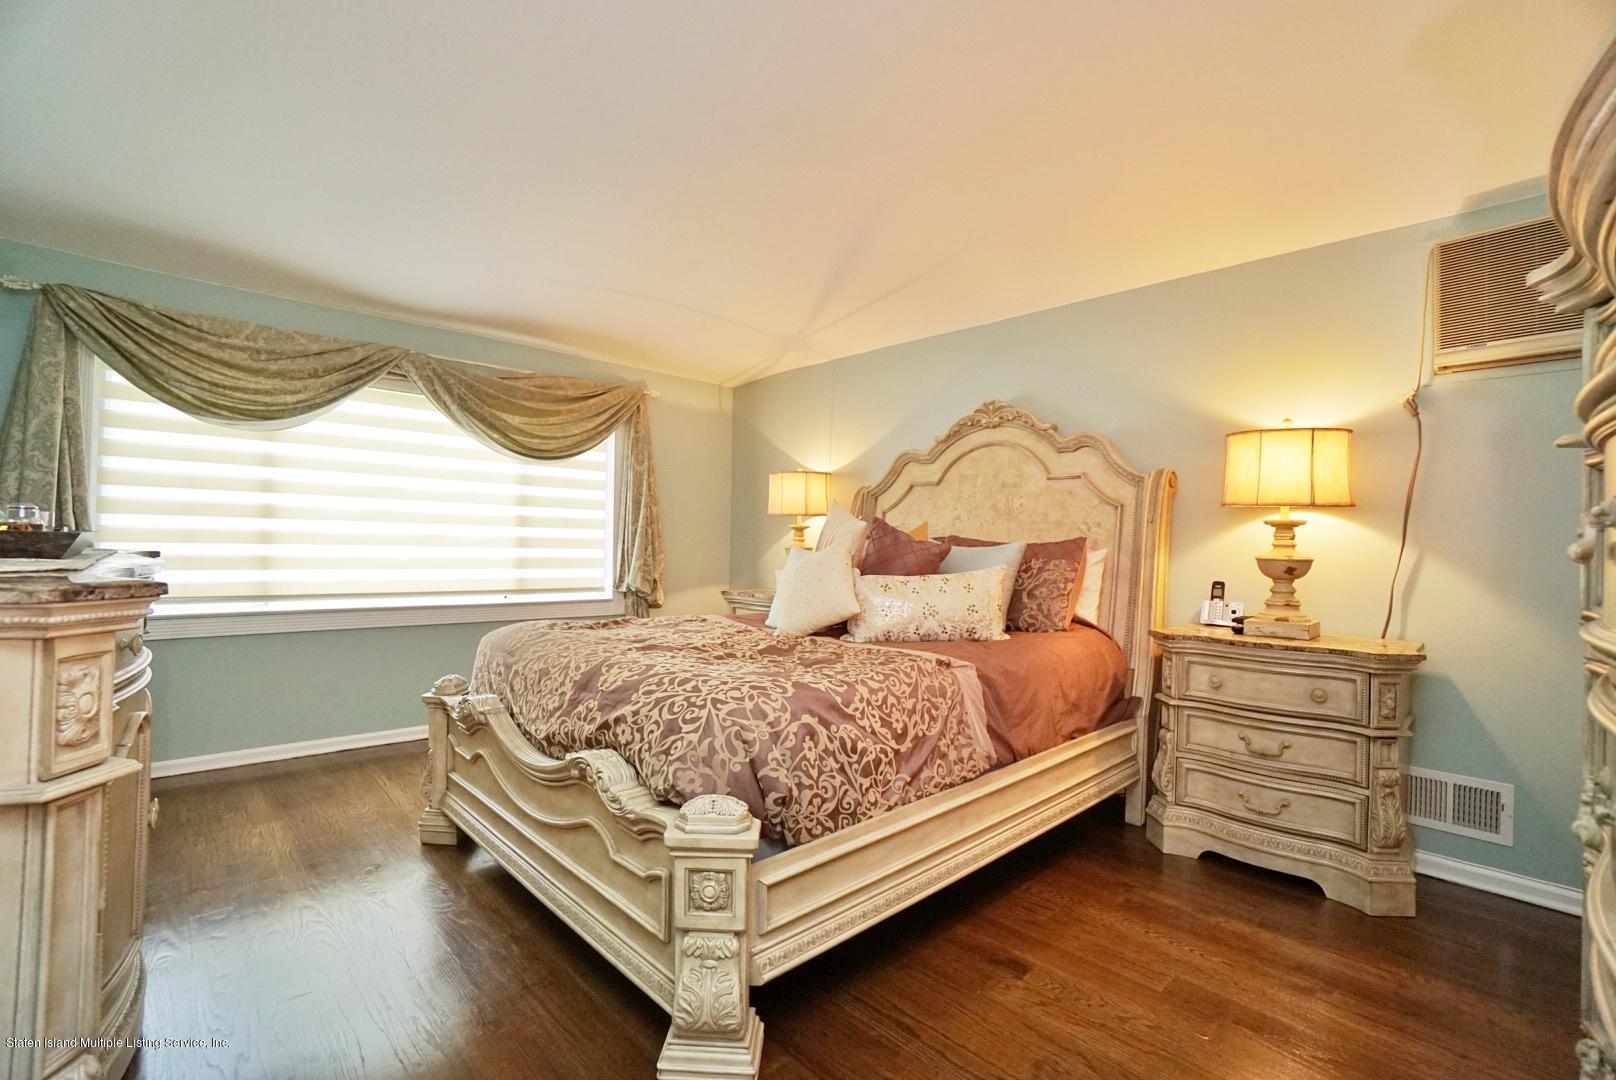 Single Family - Attached 30 Halpin Avenue  Staten Island, NY 10312, MLS-1132039-32